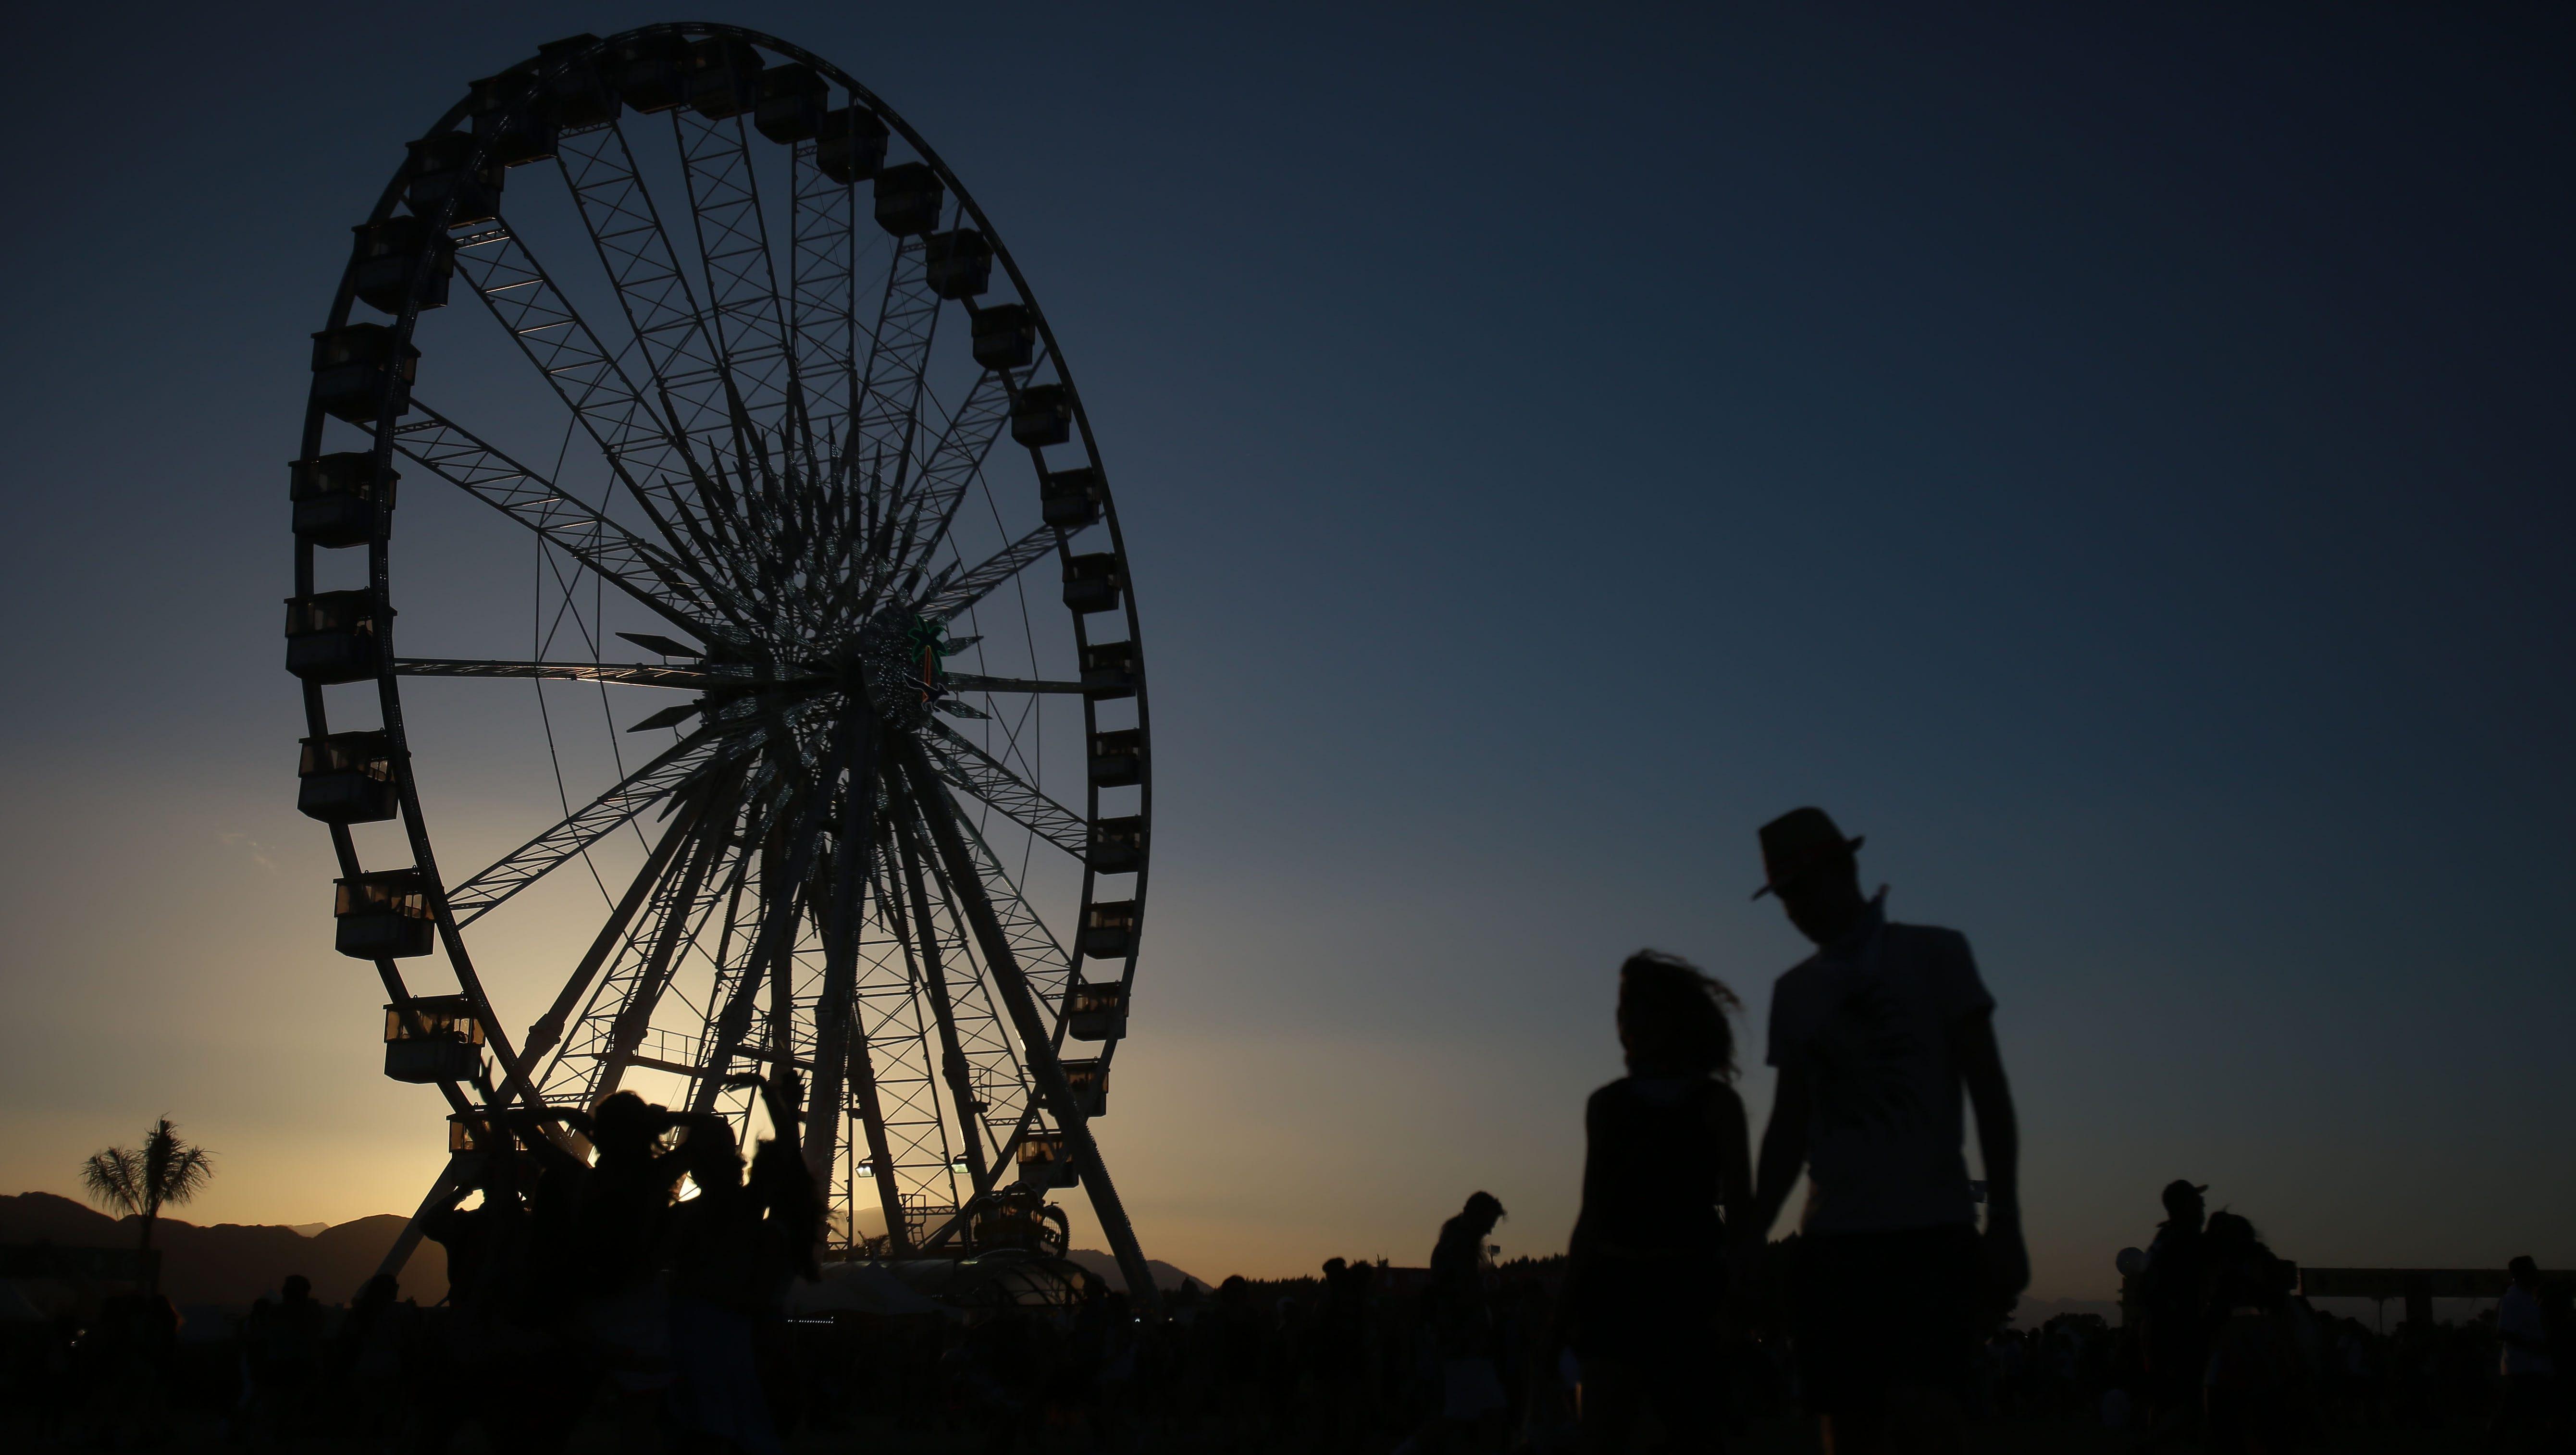 Coachella 2017 Tickets On Sale This Week